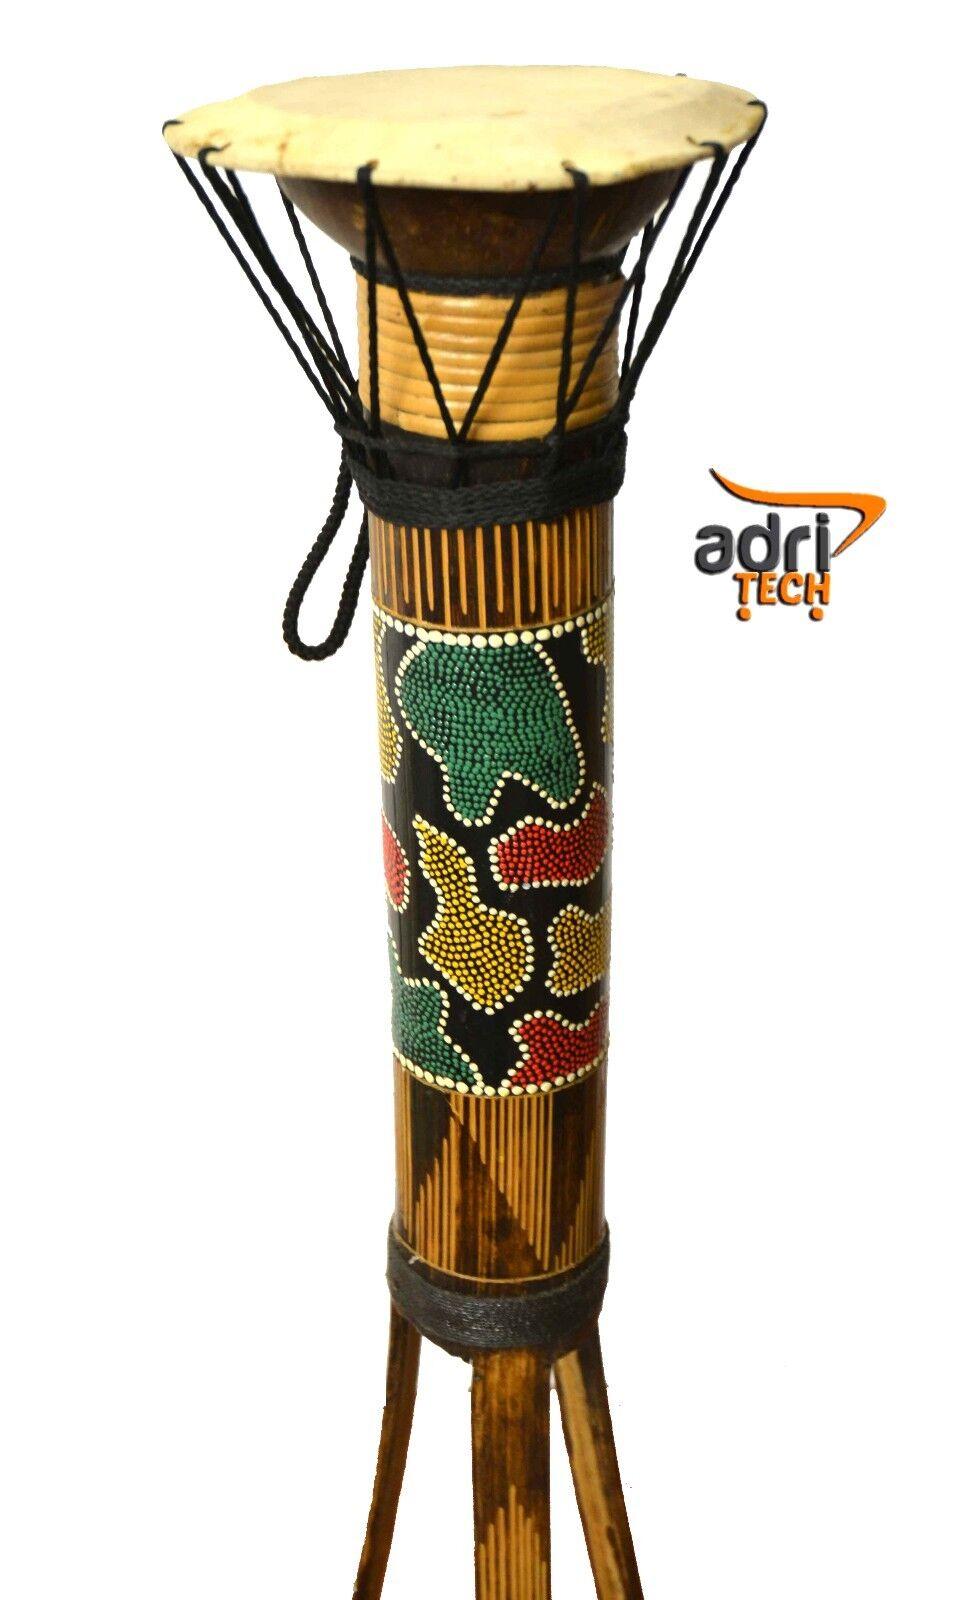 TAMBURO AFRICANO 30 CM DJEMBE DRUM AFRICAN STYLE DESIGN STRUMENTO MUSICALE